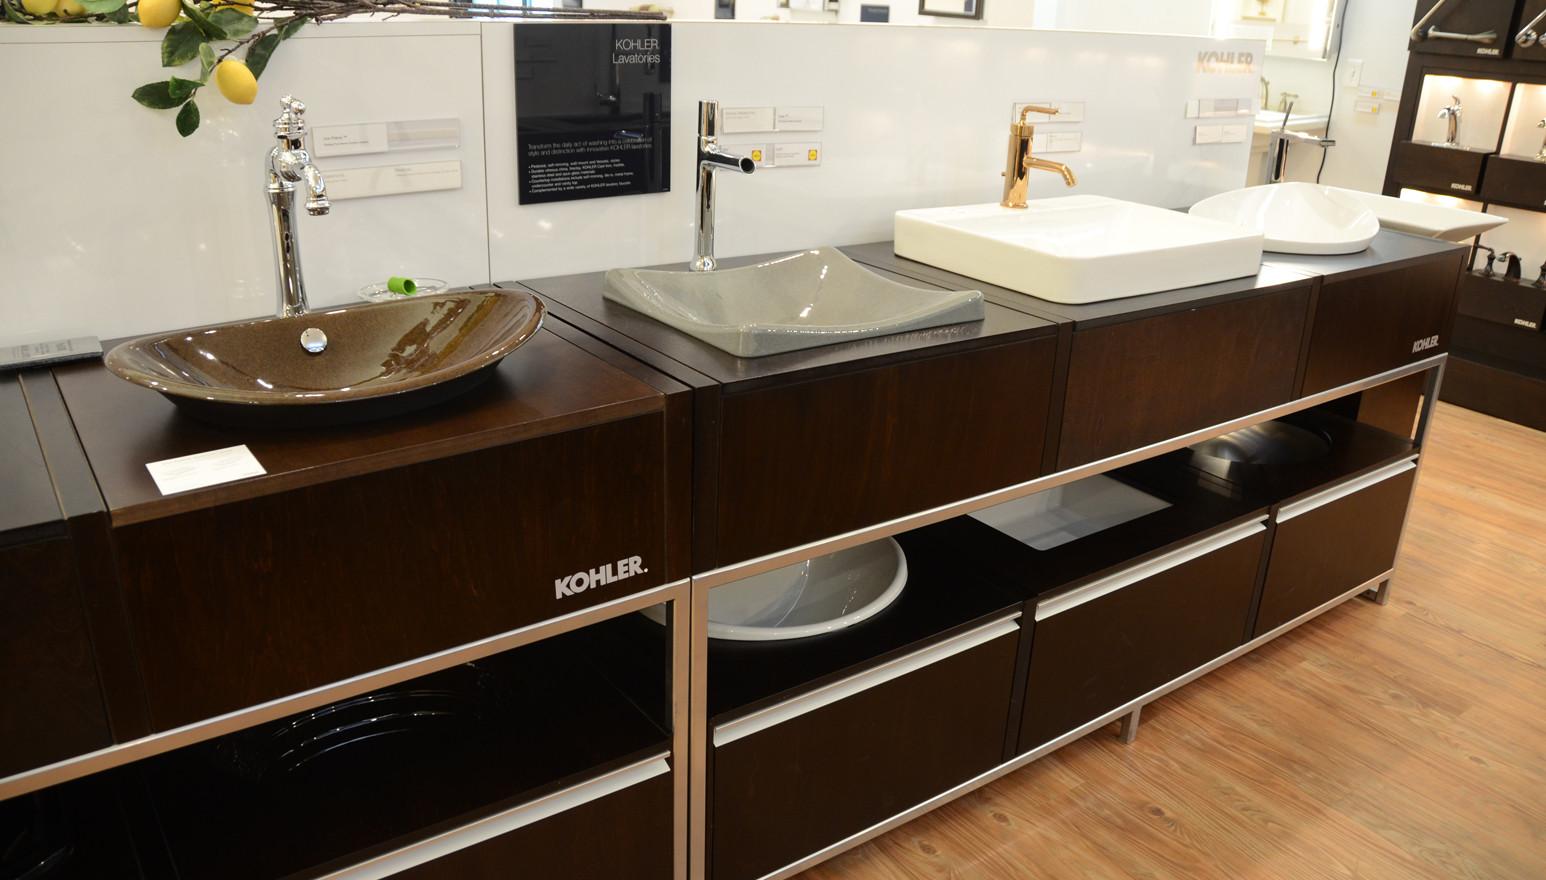 Kohler Bathroom Sinks & Faucets